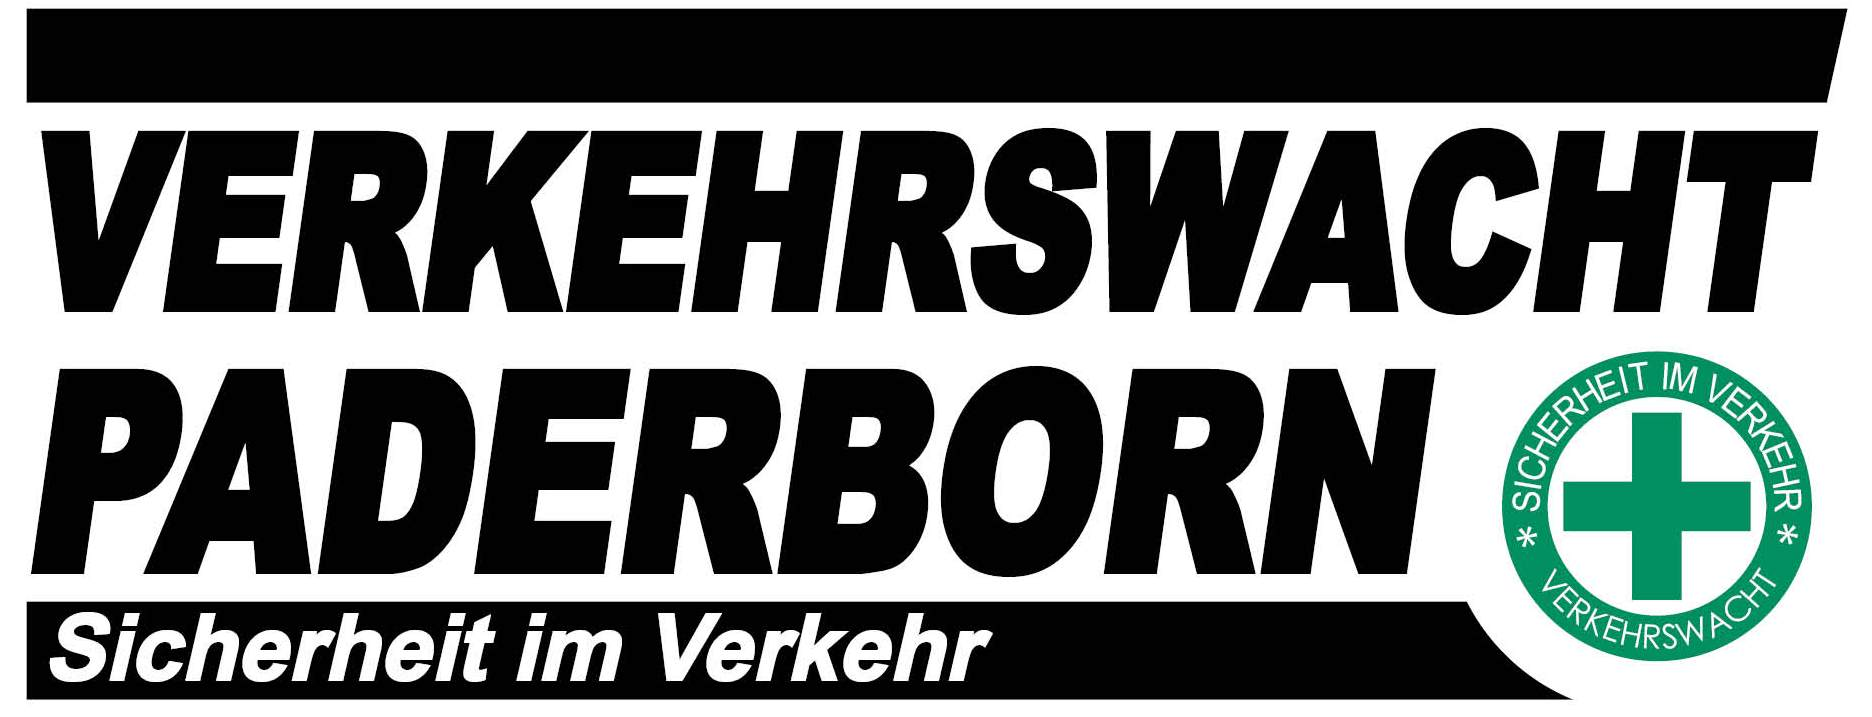 Verkehrswacht Paderborn e.V.